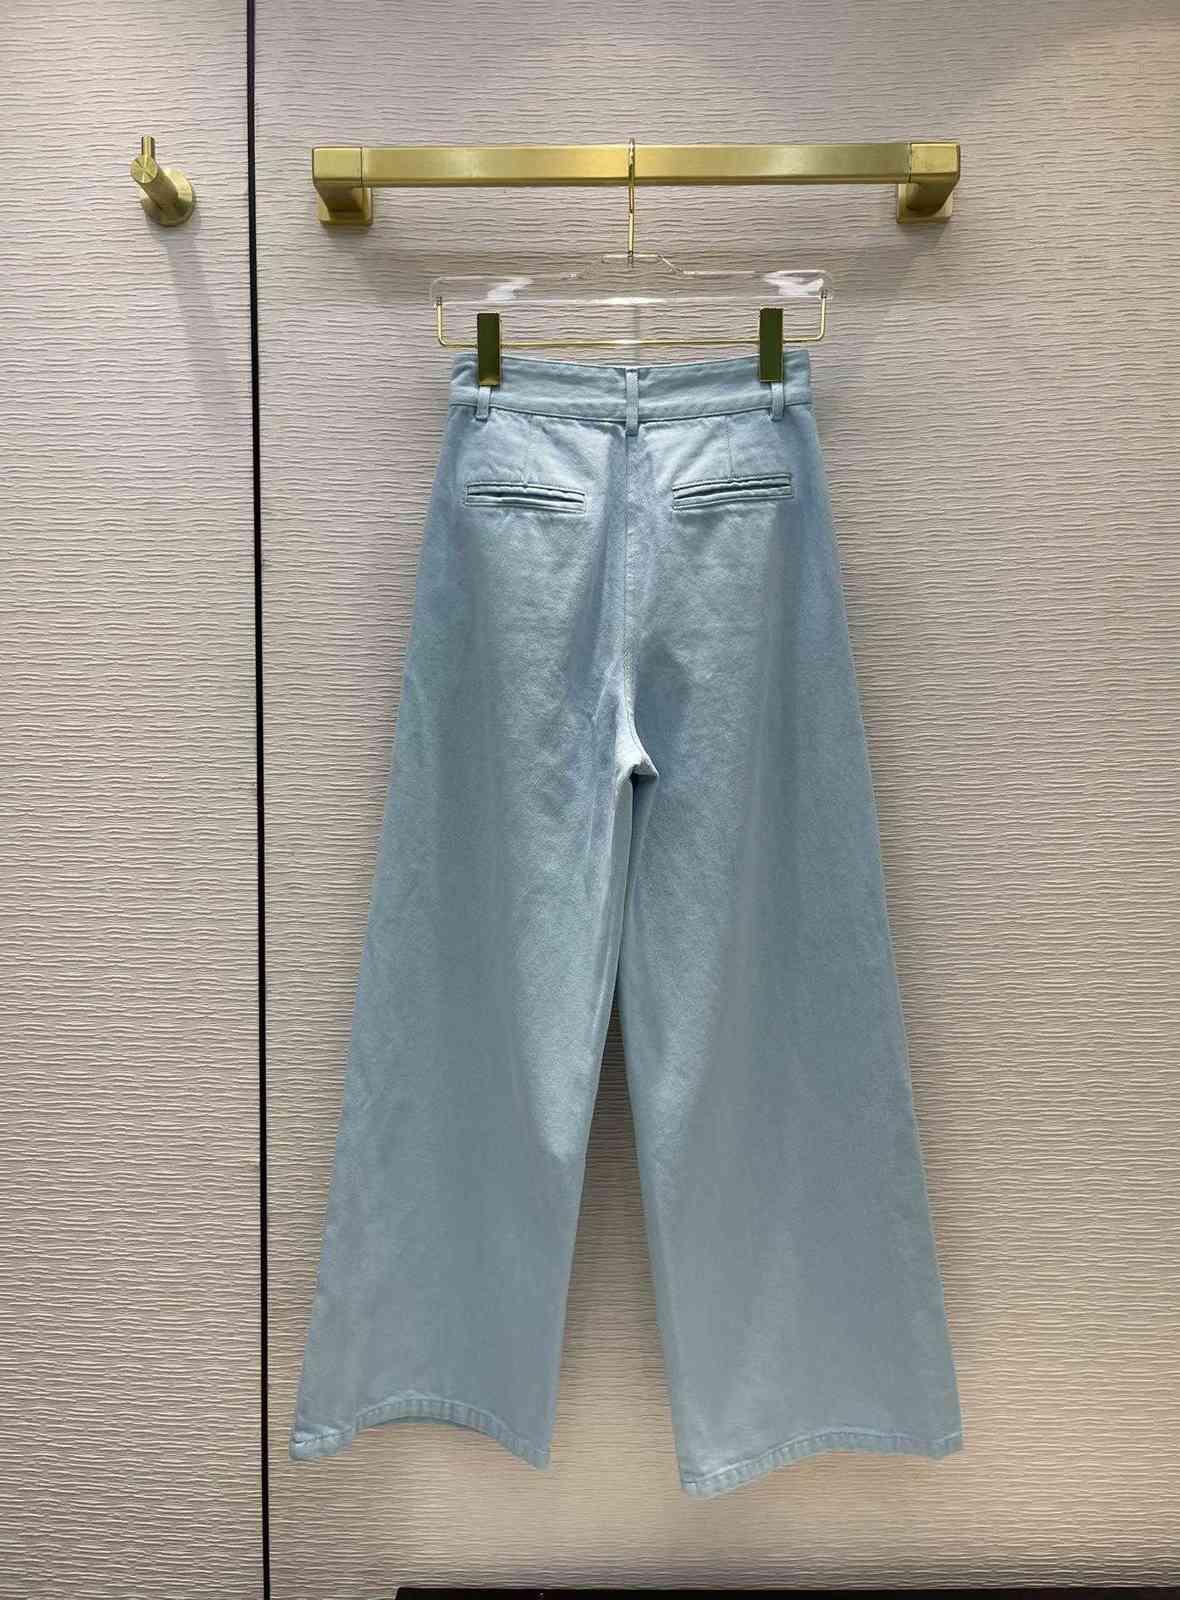 Milan Runway Jeans 2021 Autumn Fashion Designer Wide Leg Brand Same Style Luxury Women's Clothing 0611-2